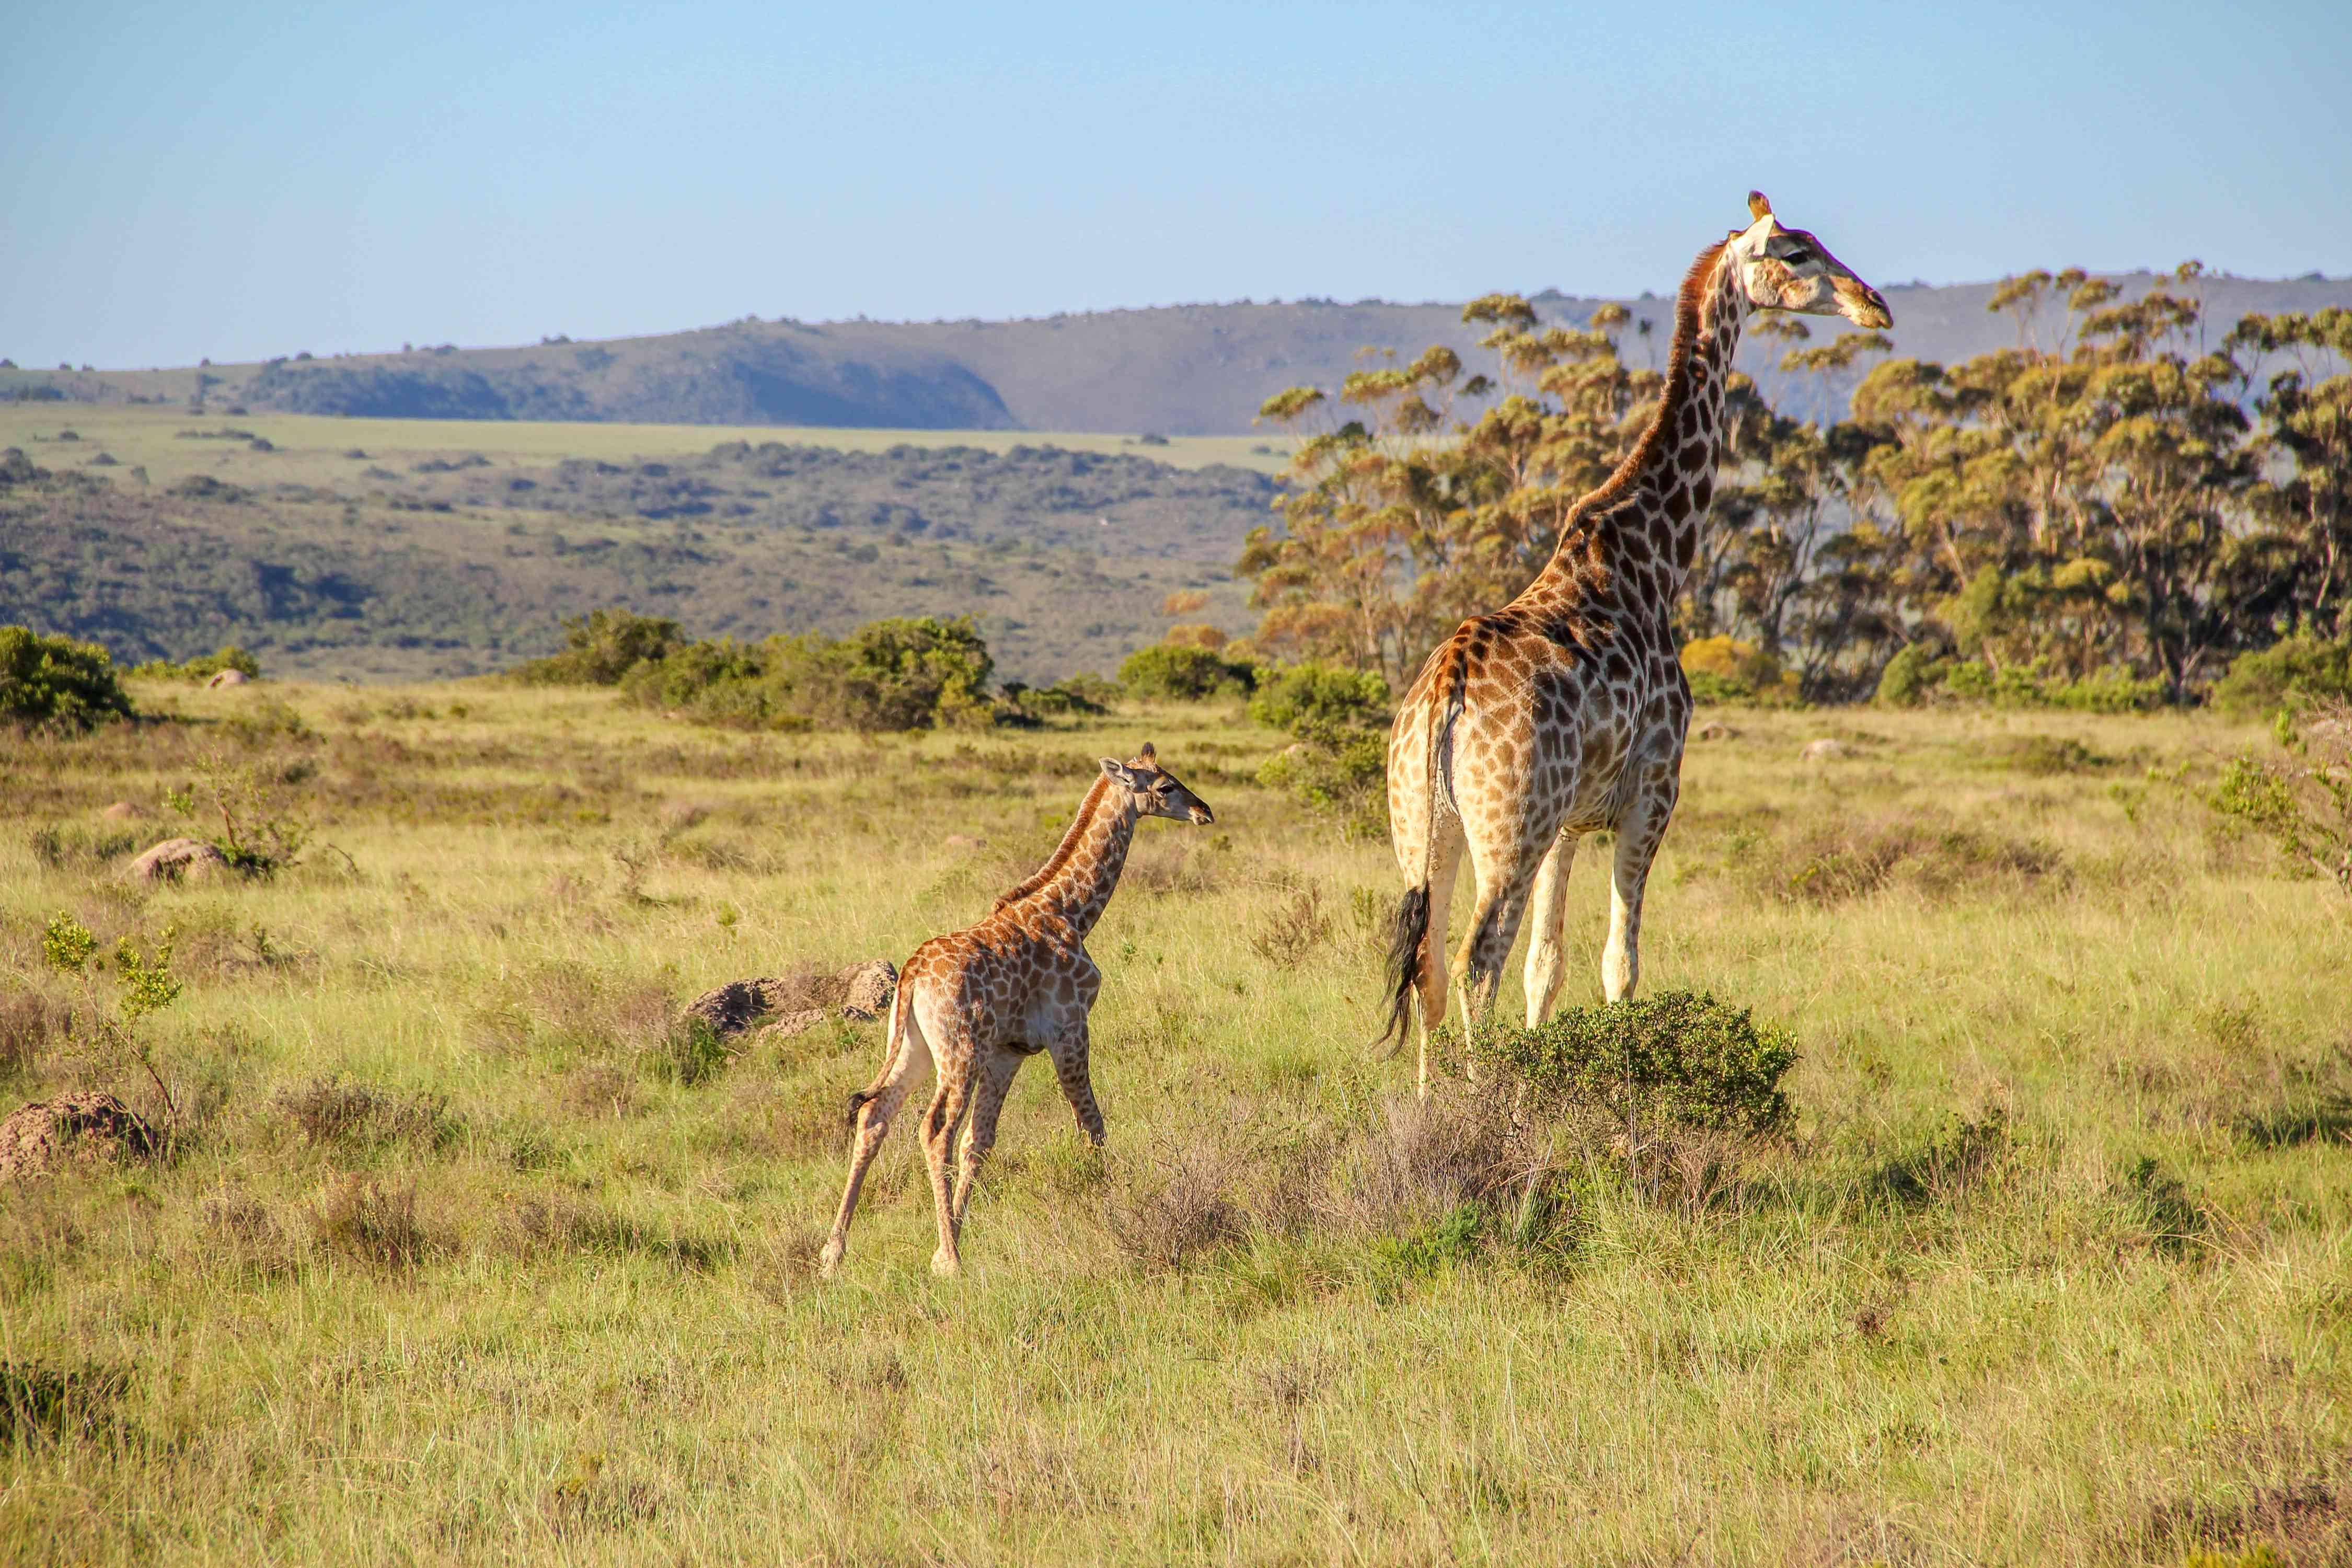 mother and calf giraffe at Shamwari Game Reserve in South Africa